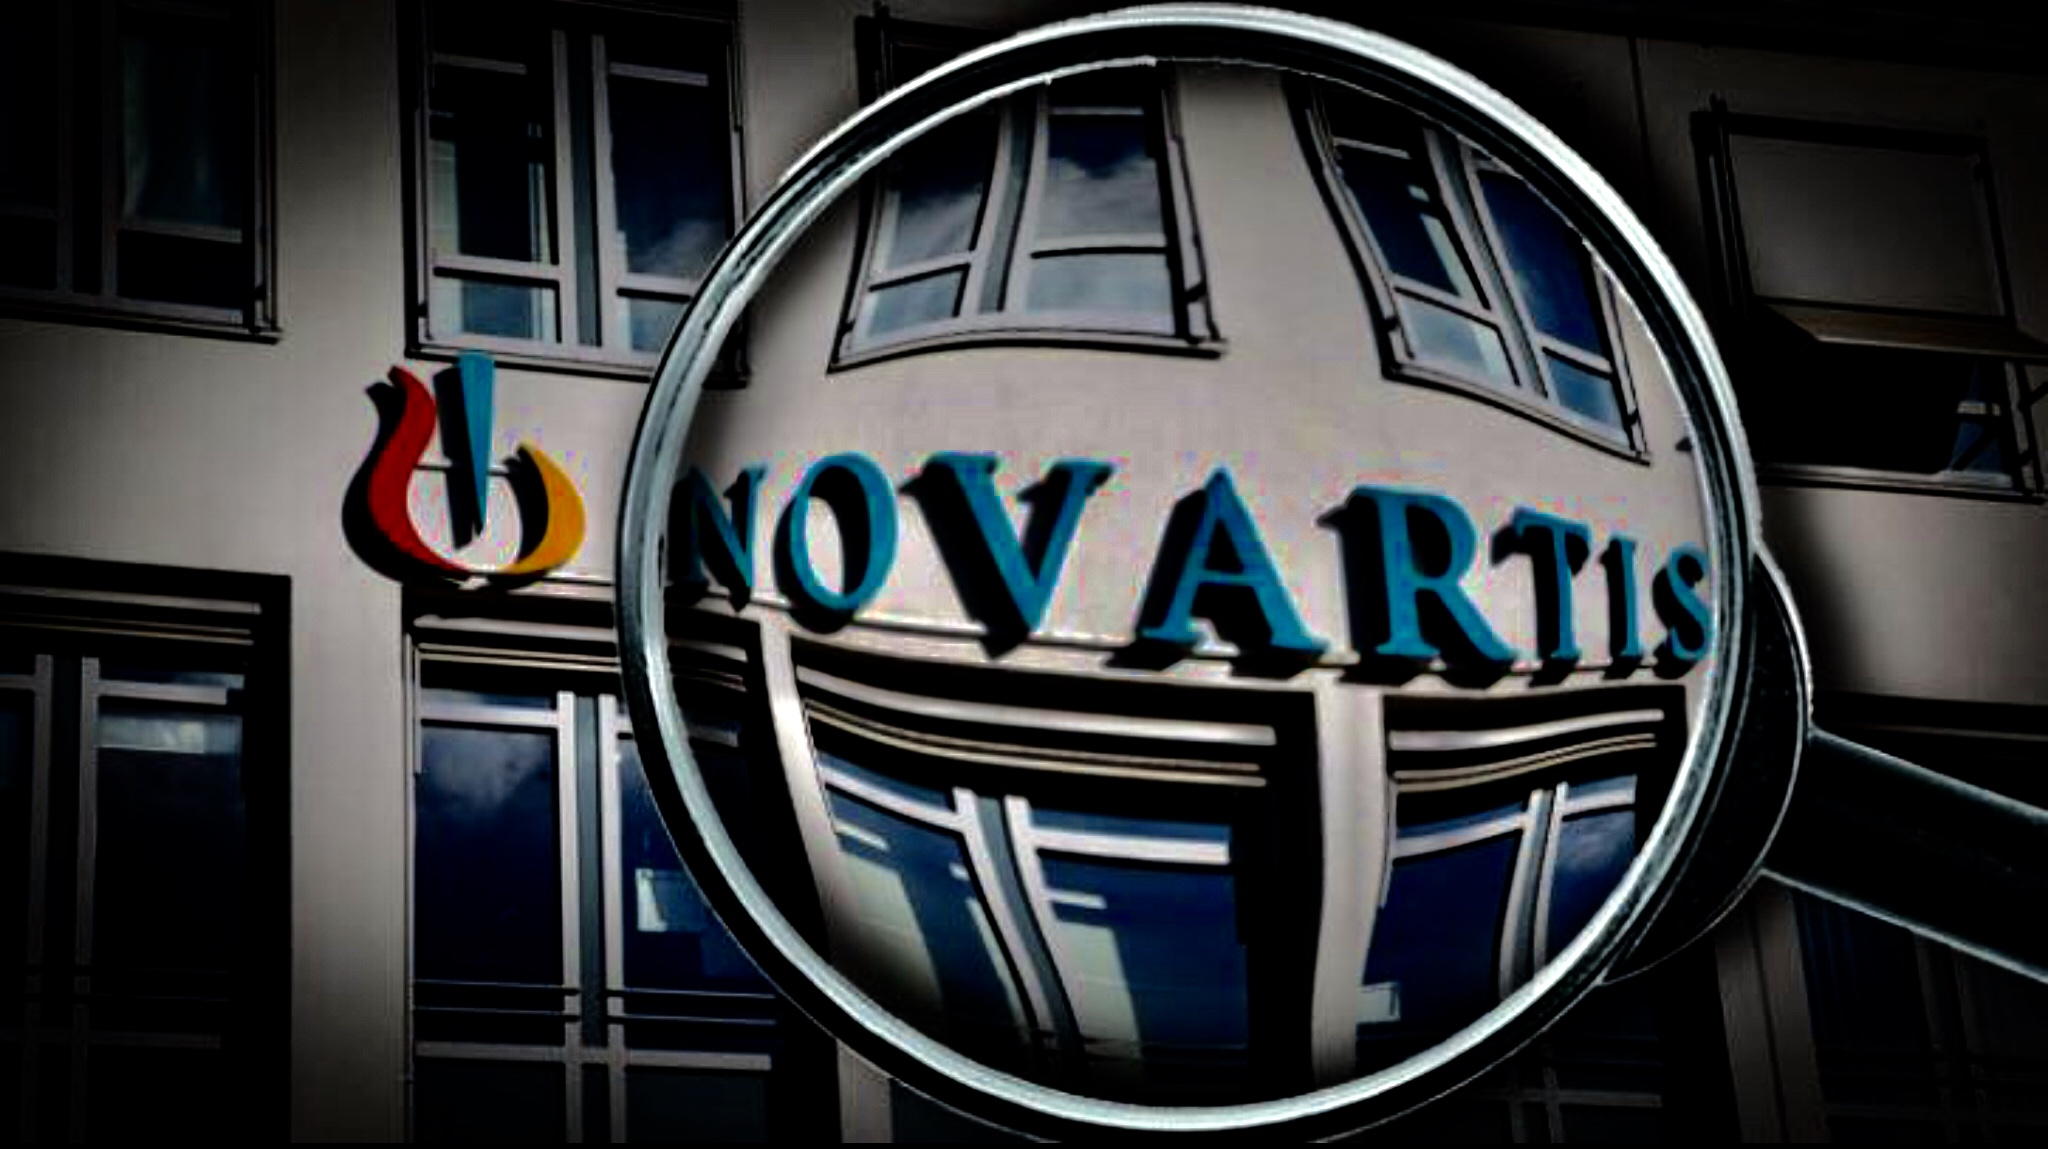 #NOVARTIS-Πώς καταλαβαίνετε ότι κάποιος ύποπτος λέει ψέματα: Τα 11 αλάνθαστα σημάδια του FBI που τον «ξεσκεπάζουν» #Novartis_gate